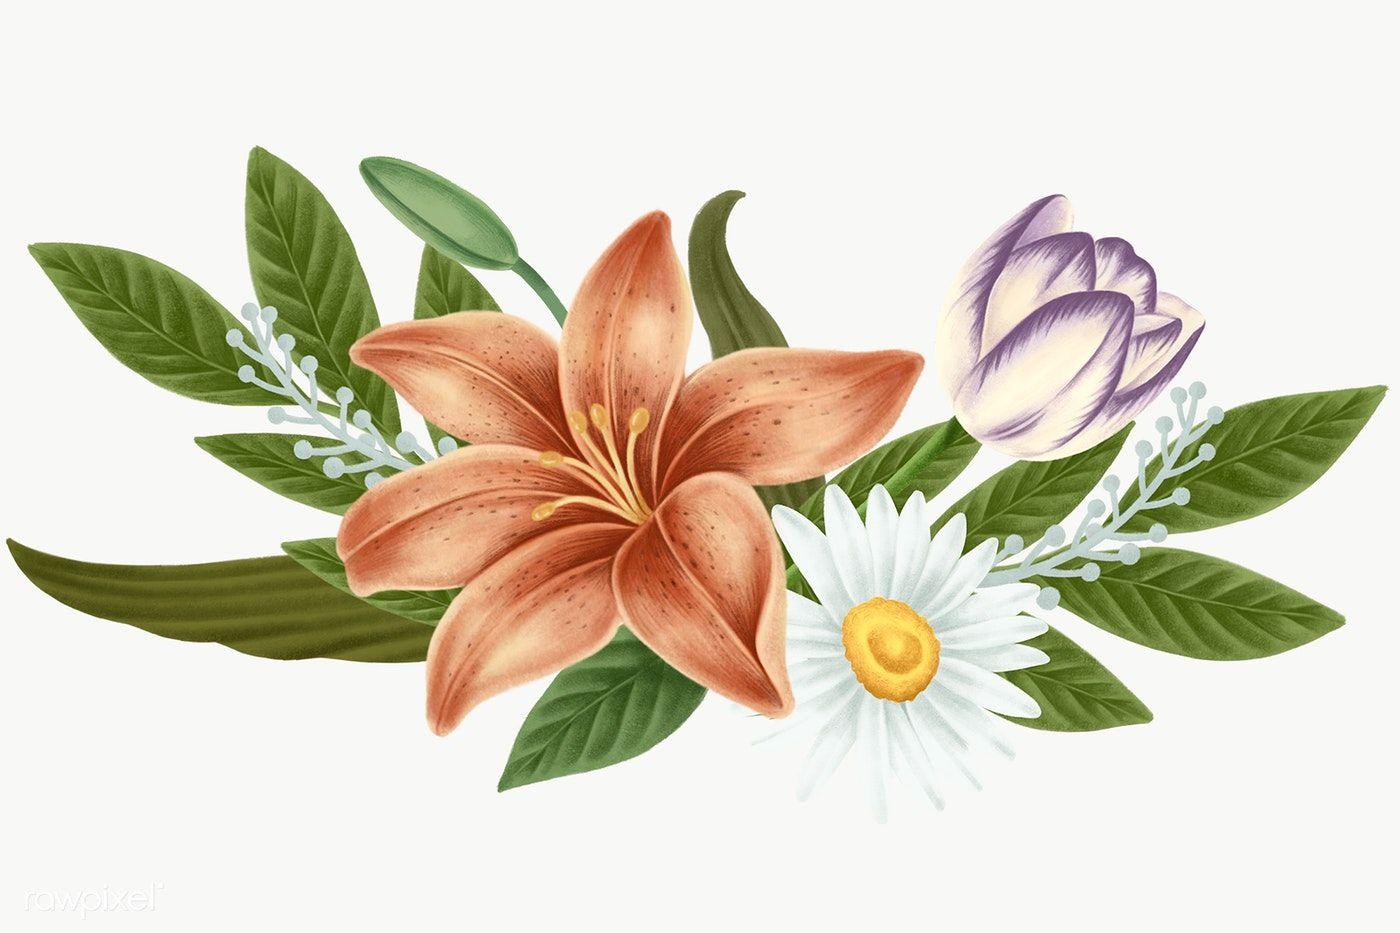 Vintage Flower Bouquet Transparent Png Premium Image By Rawpixel Com Noon Flower Illustration Vintage Flowers Flower Drawing